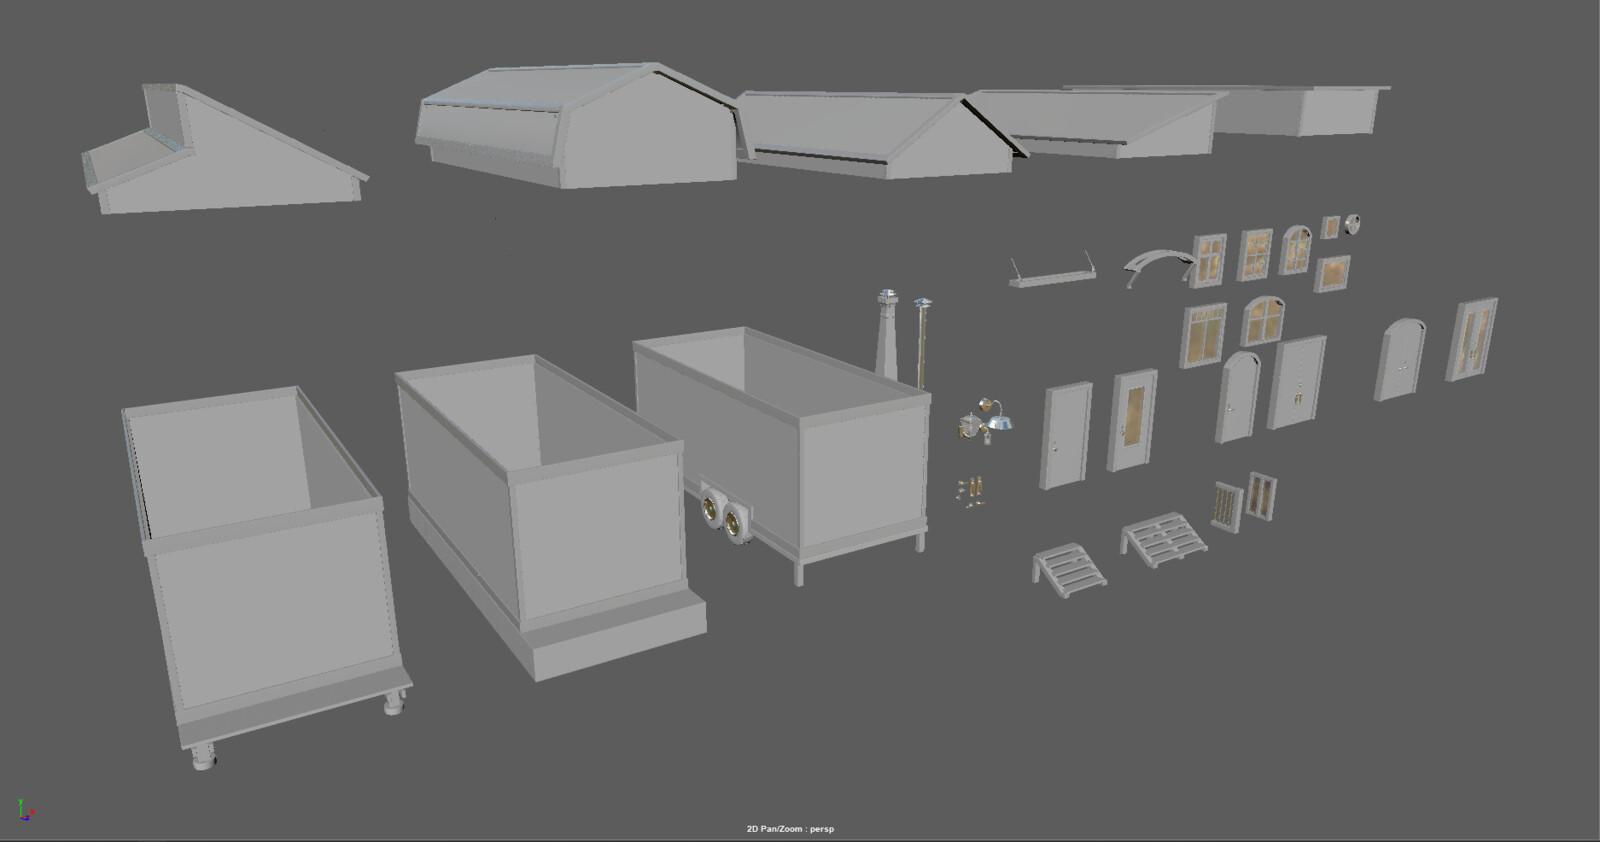 All modular pieces